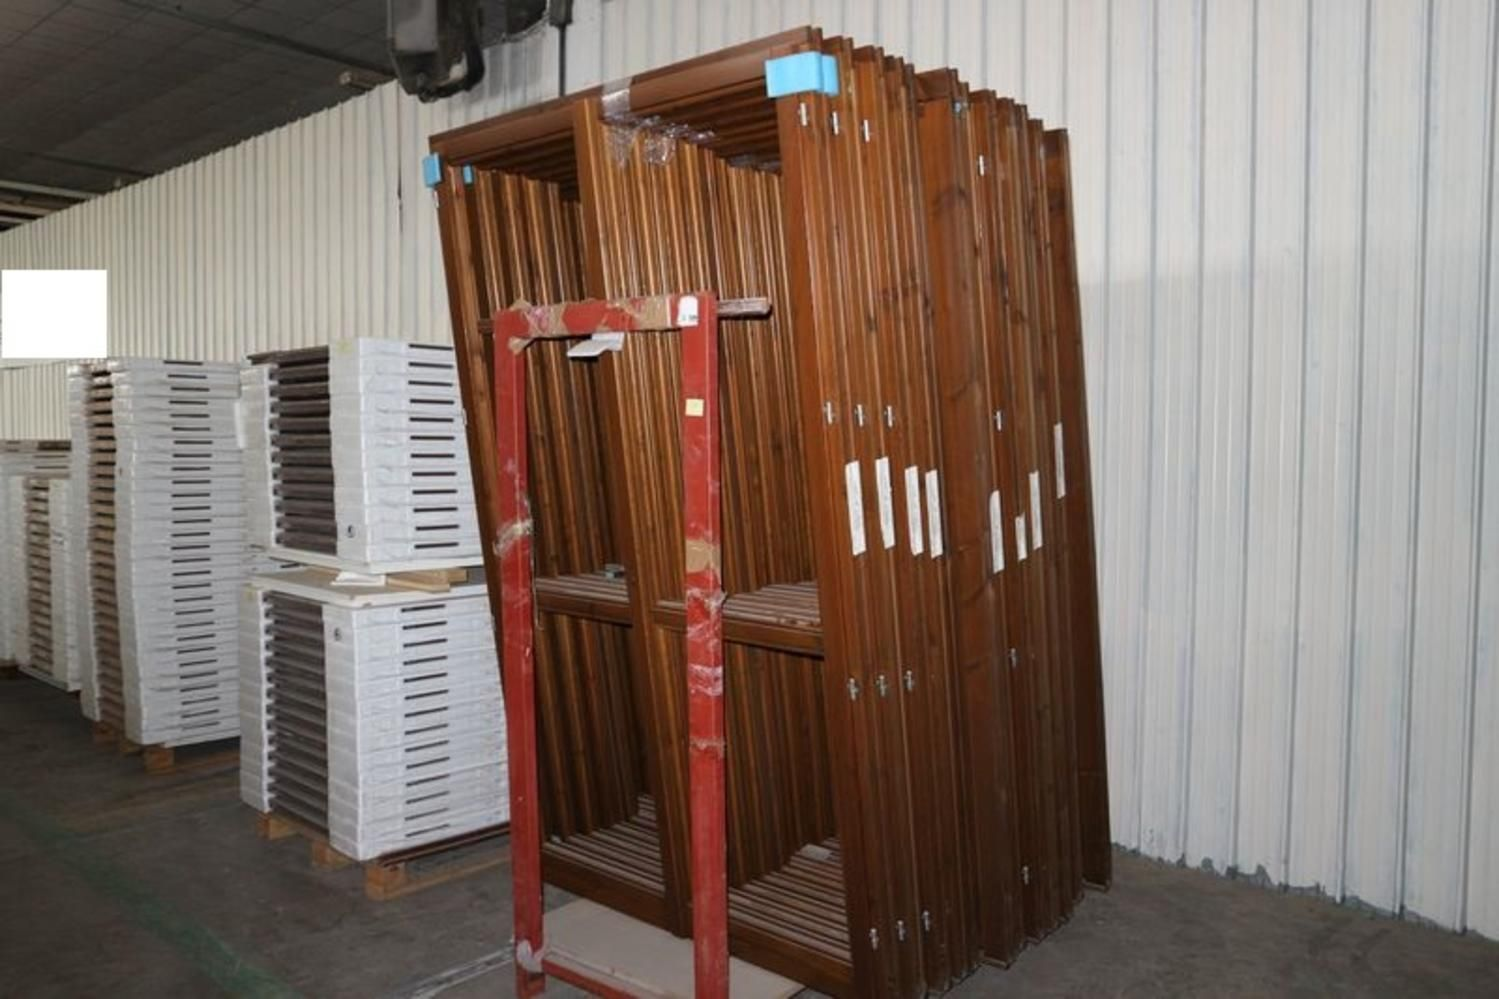 Halbfertige Türen und Fertigerzeugnisse